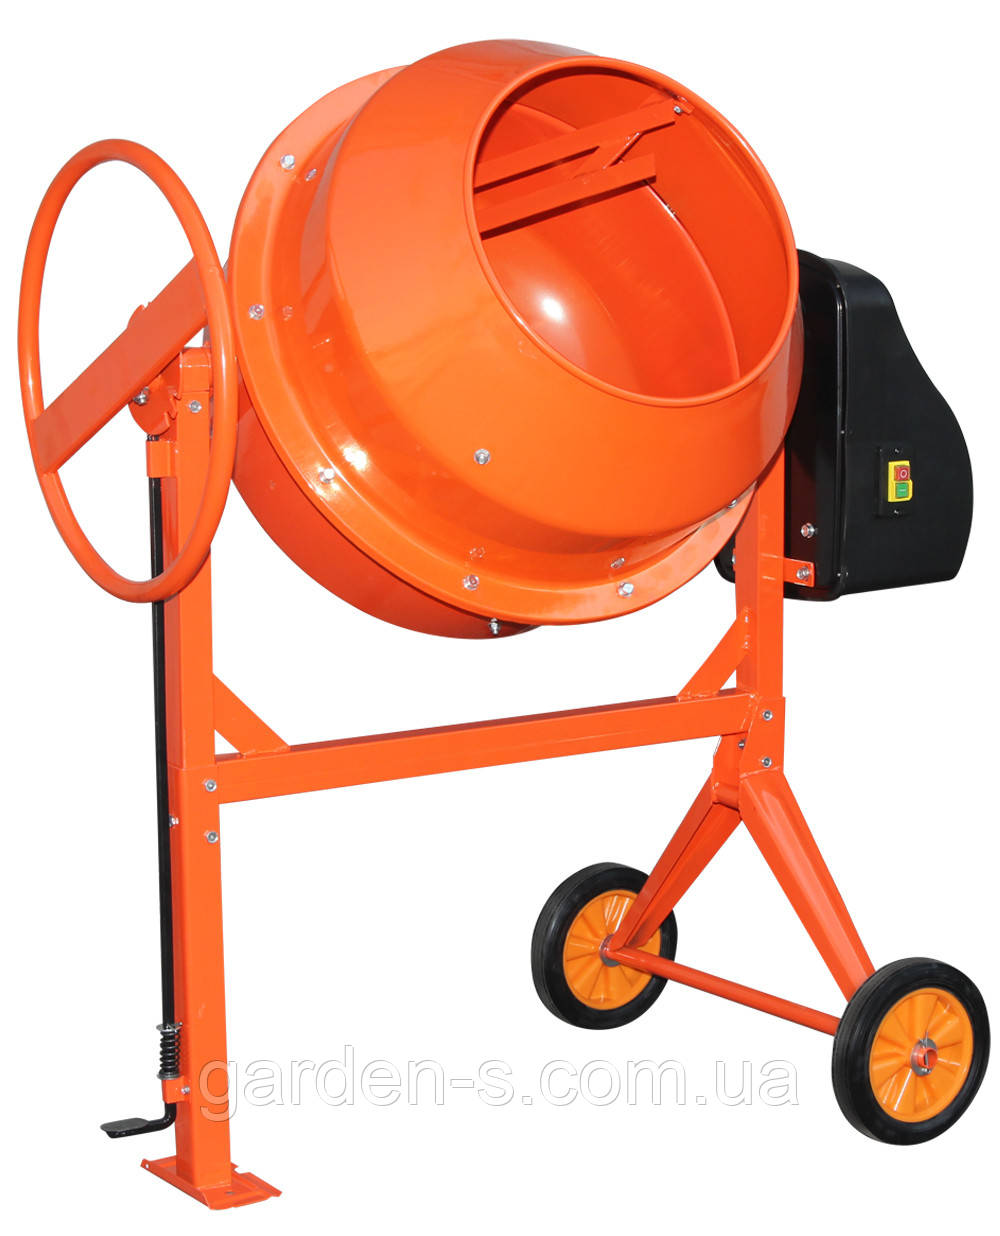 Бетономешалка Кентавр БМ-180М (оранжевая)